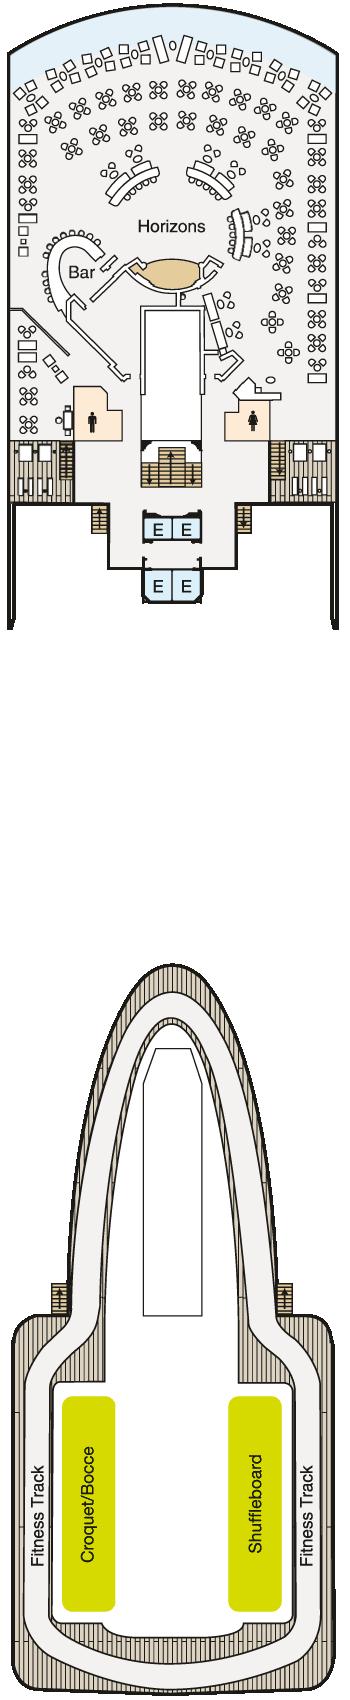 MS Marina - Deck 15